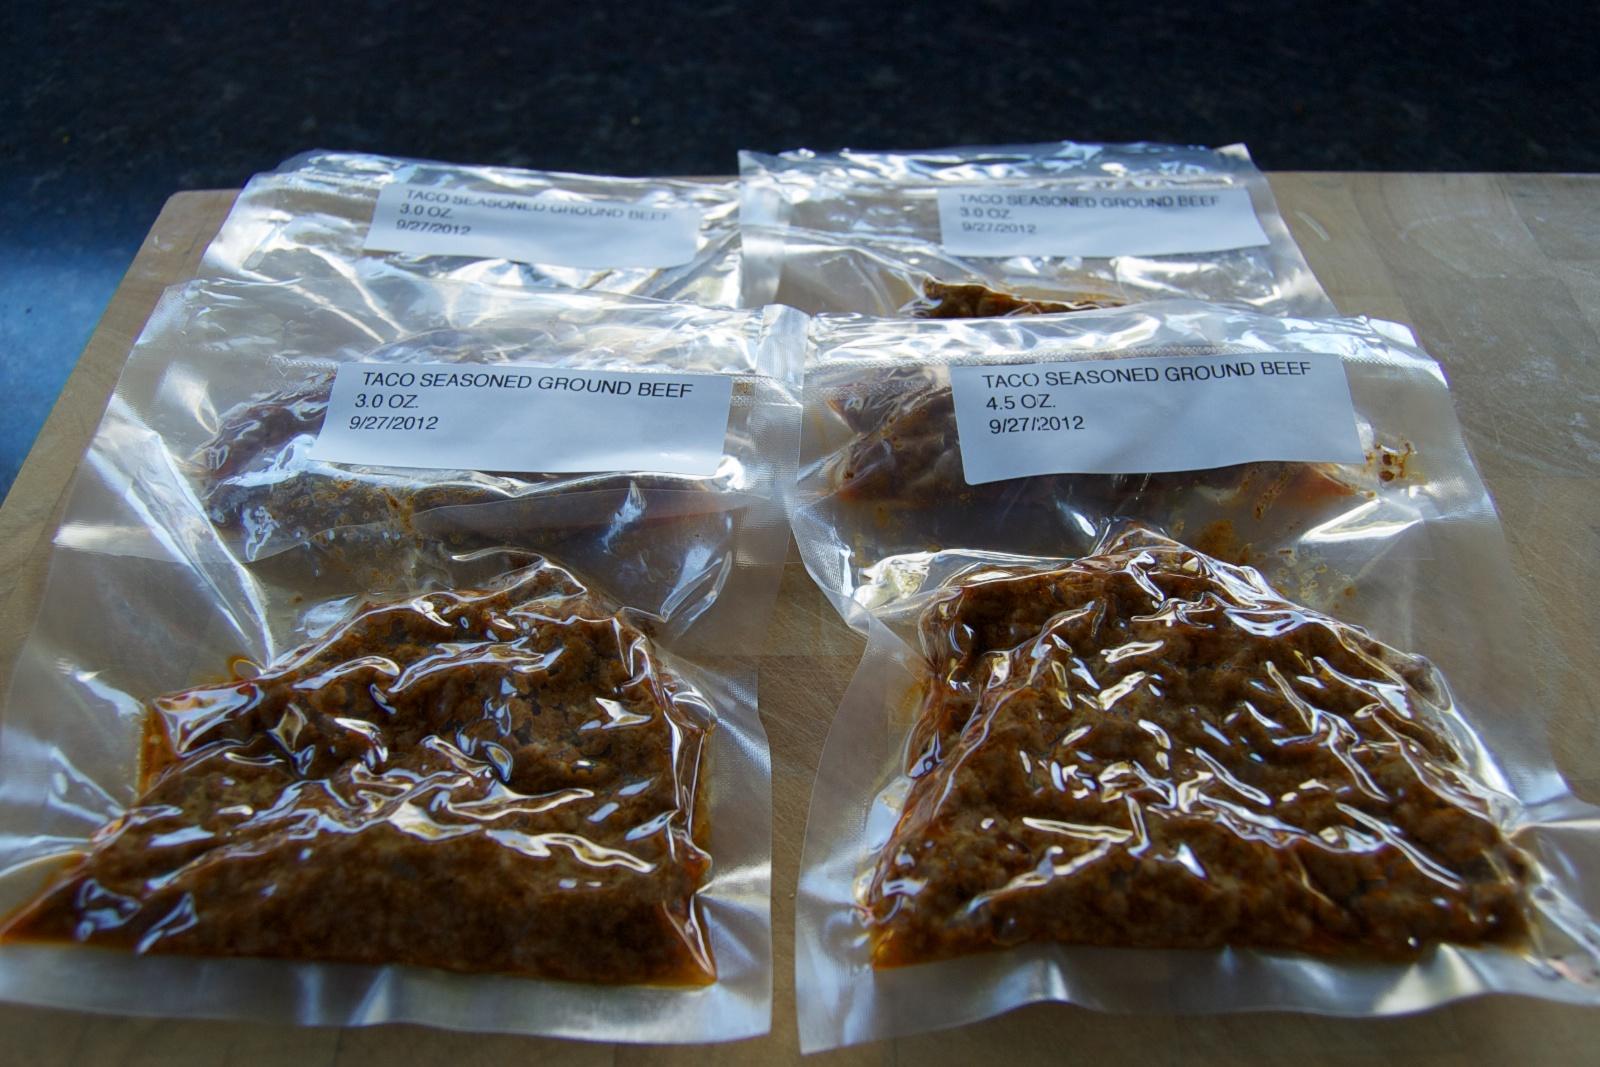 http://blog.rickk.com/food/2012/09/27/ate.2012.09.27.c13.jpg